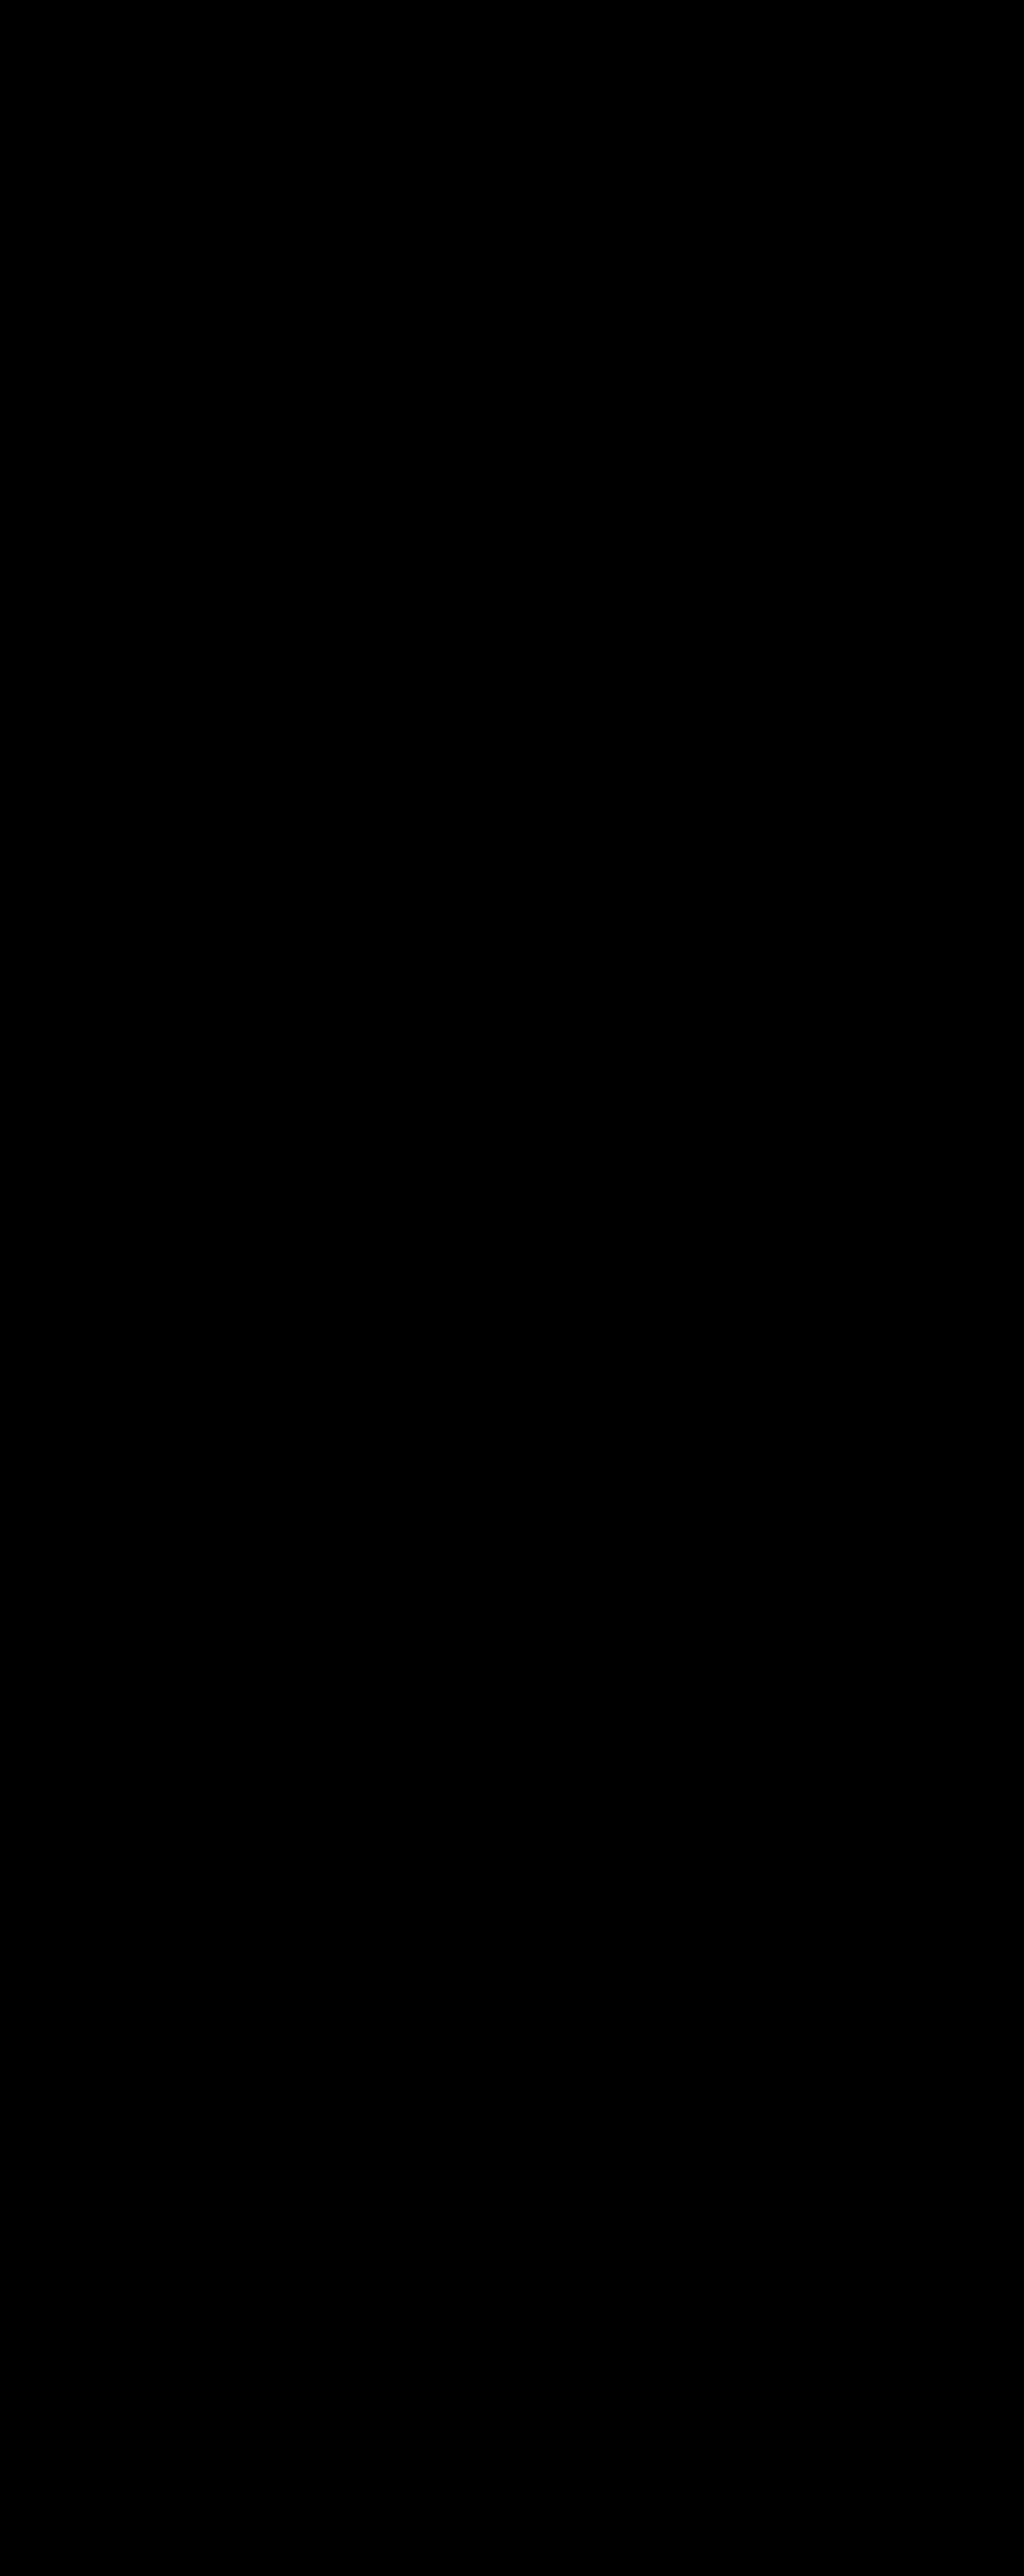 2000x5030 Fileband Silhouette 07.svg